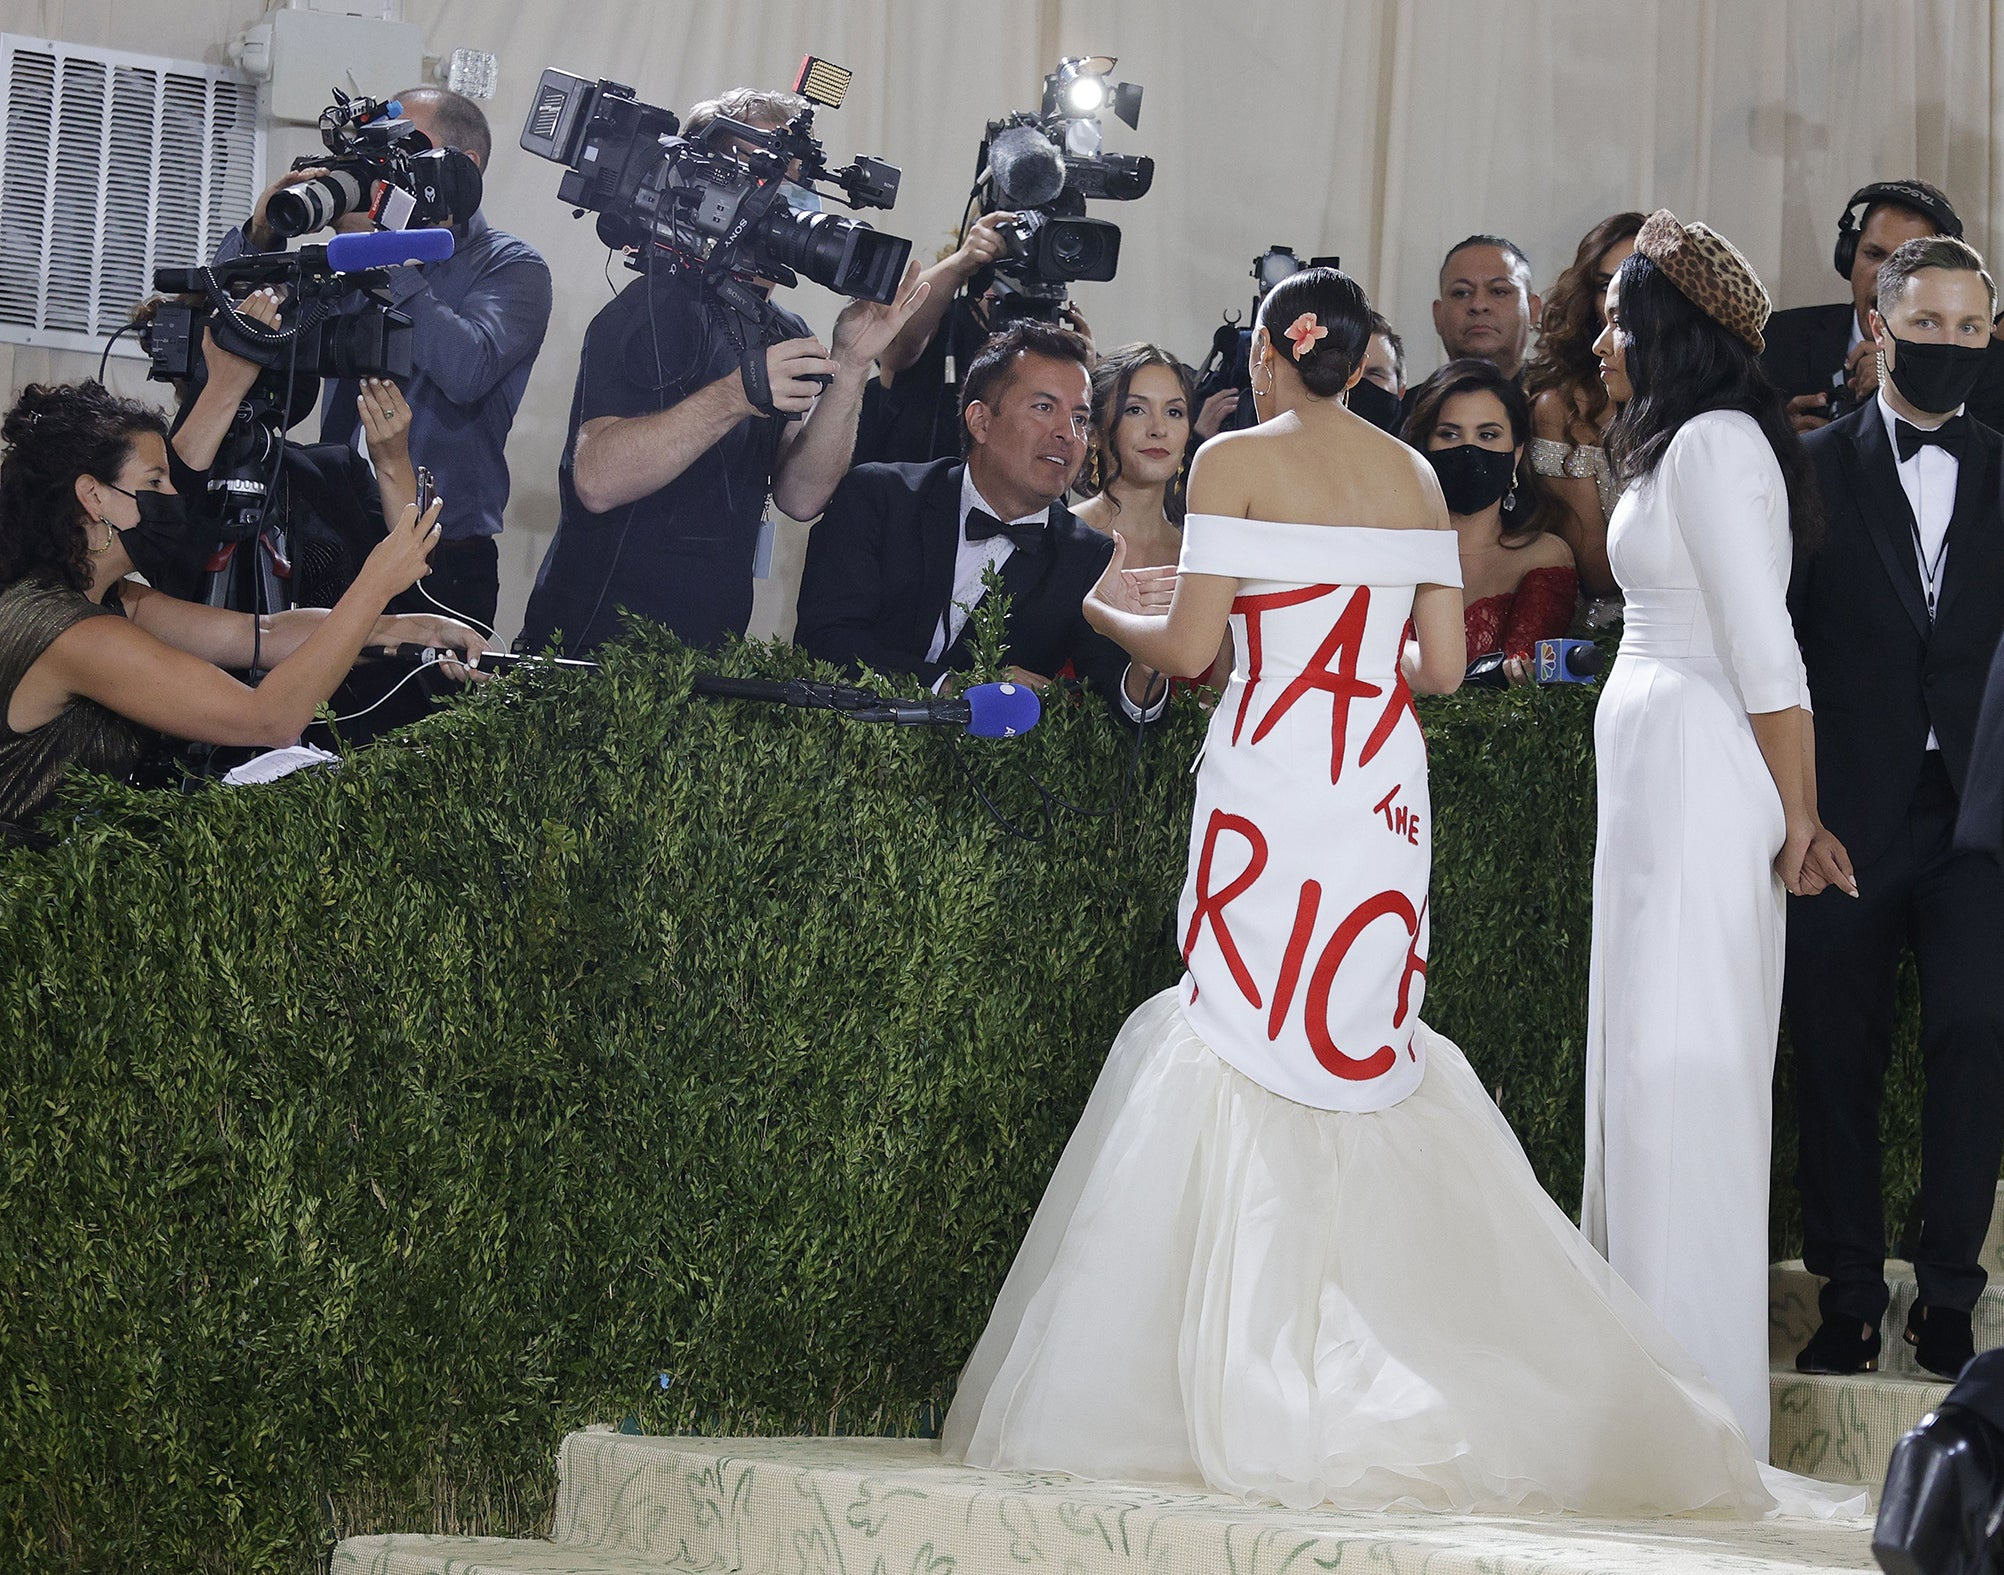 Alexandria Ocasio-Cortez's Met Gala gown won't change the system